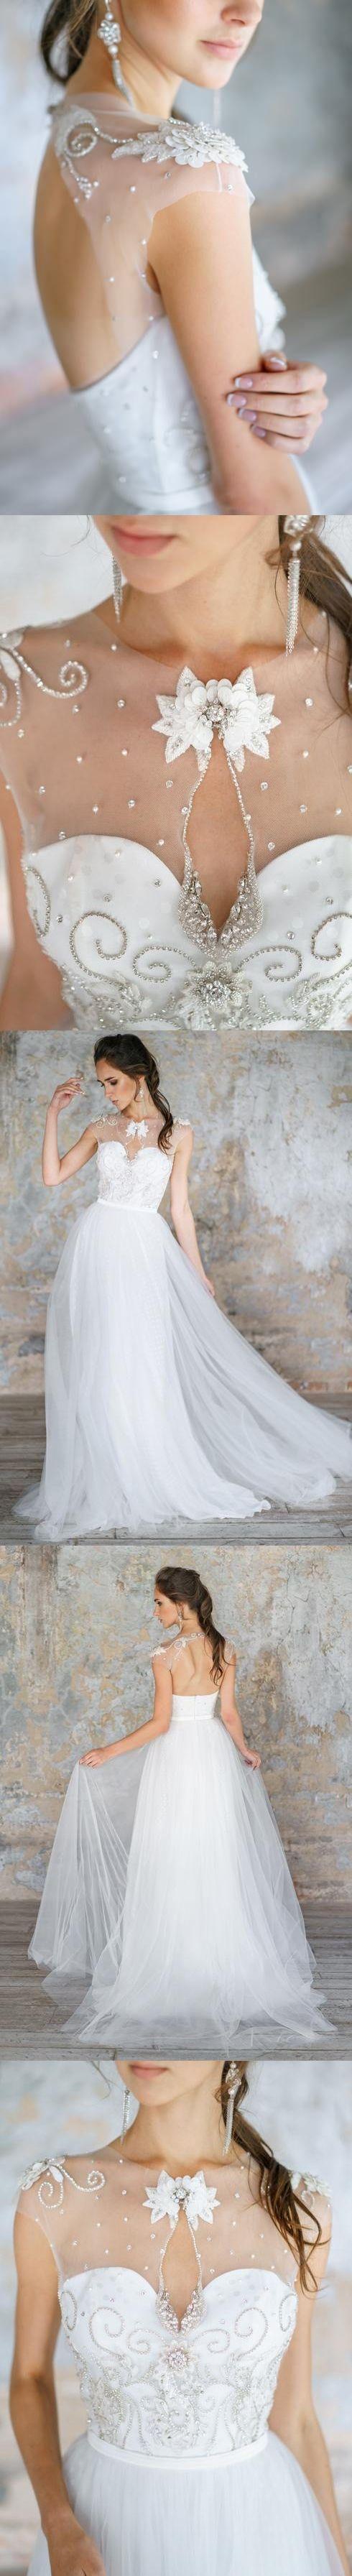 Rhinestone wedding dresses  Chic Wedding Dresses Aline Scoop Rhinestone Short Train Tulle